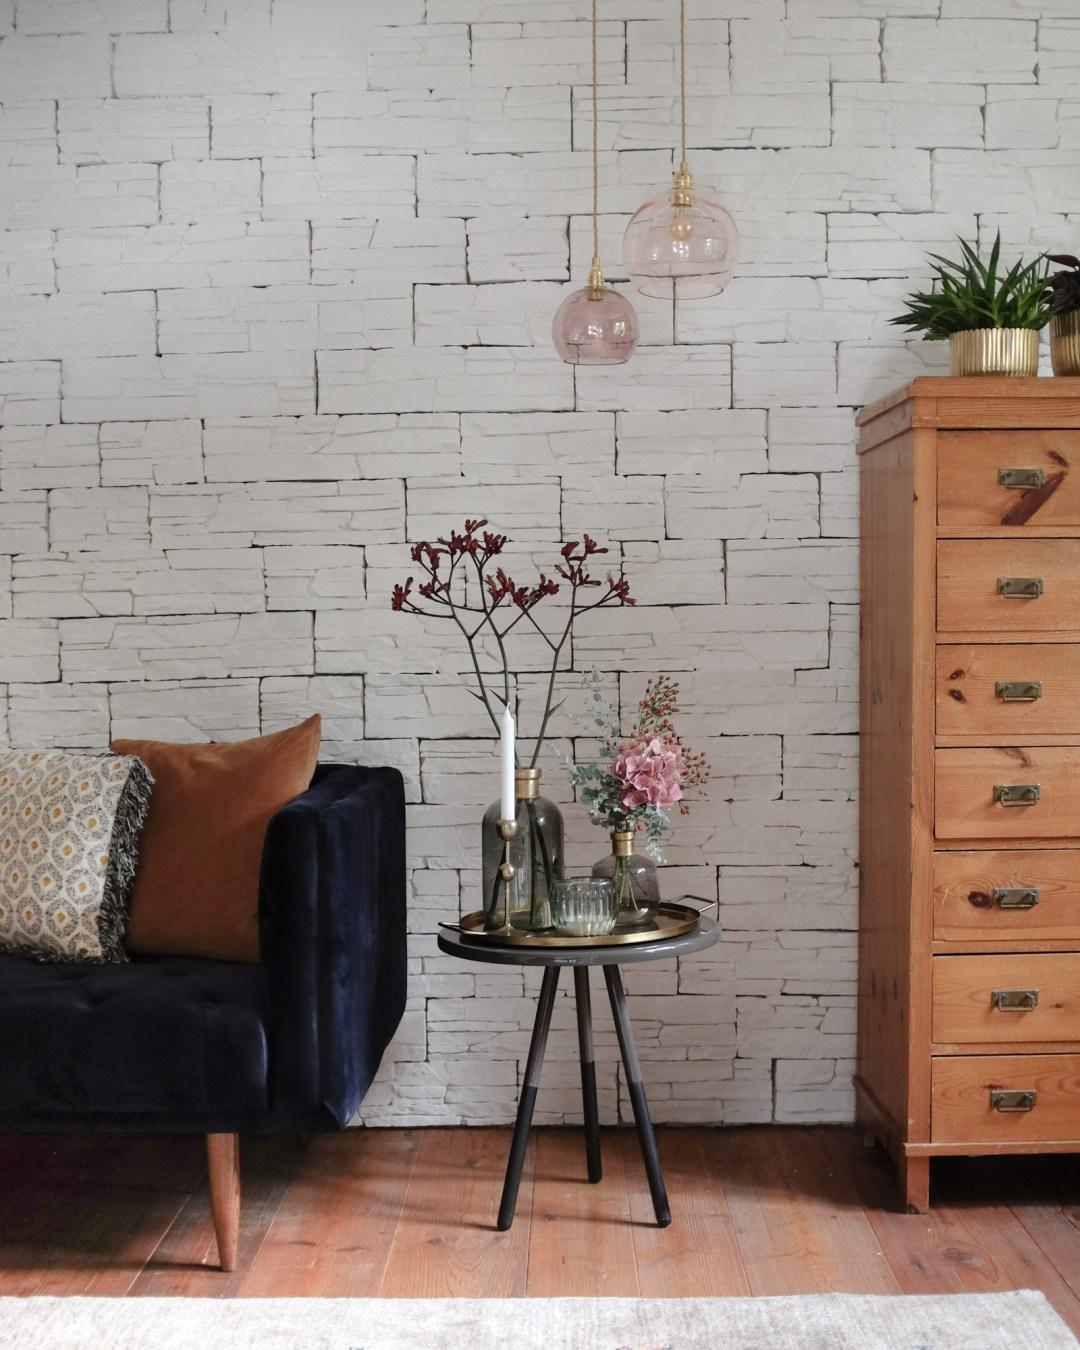 Inastil, Interieur, Sofacompany, Sofa, Herbstdekoration, Homedecor, Homestyling, Wohnzimmer,_